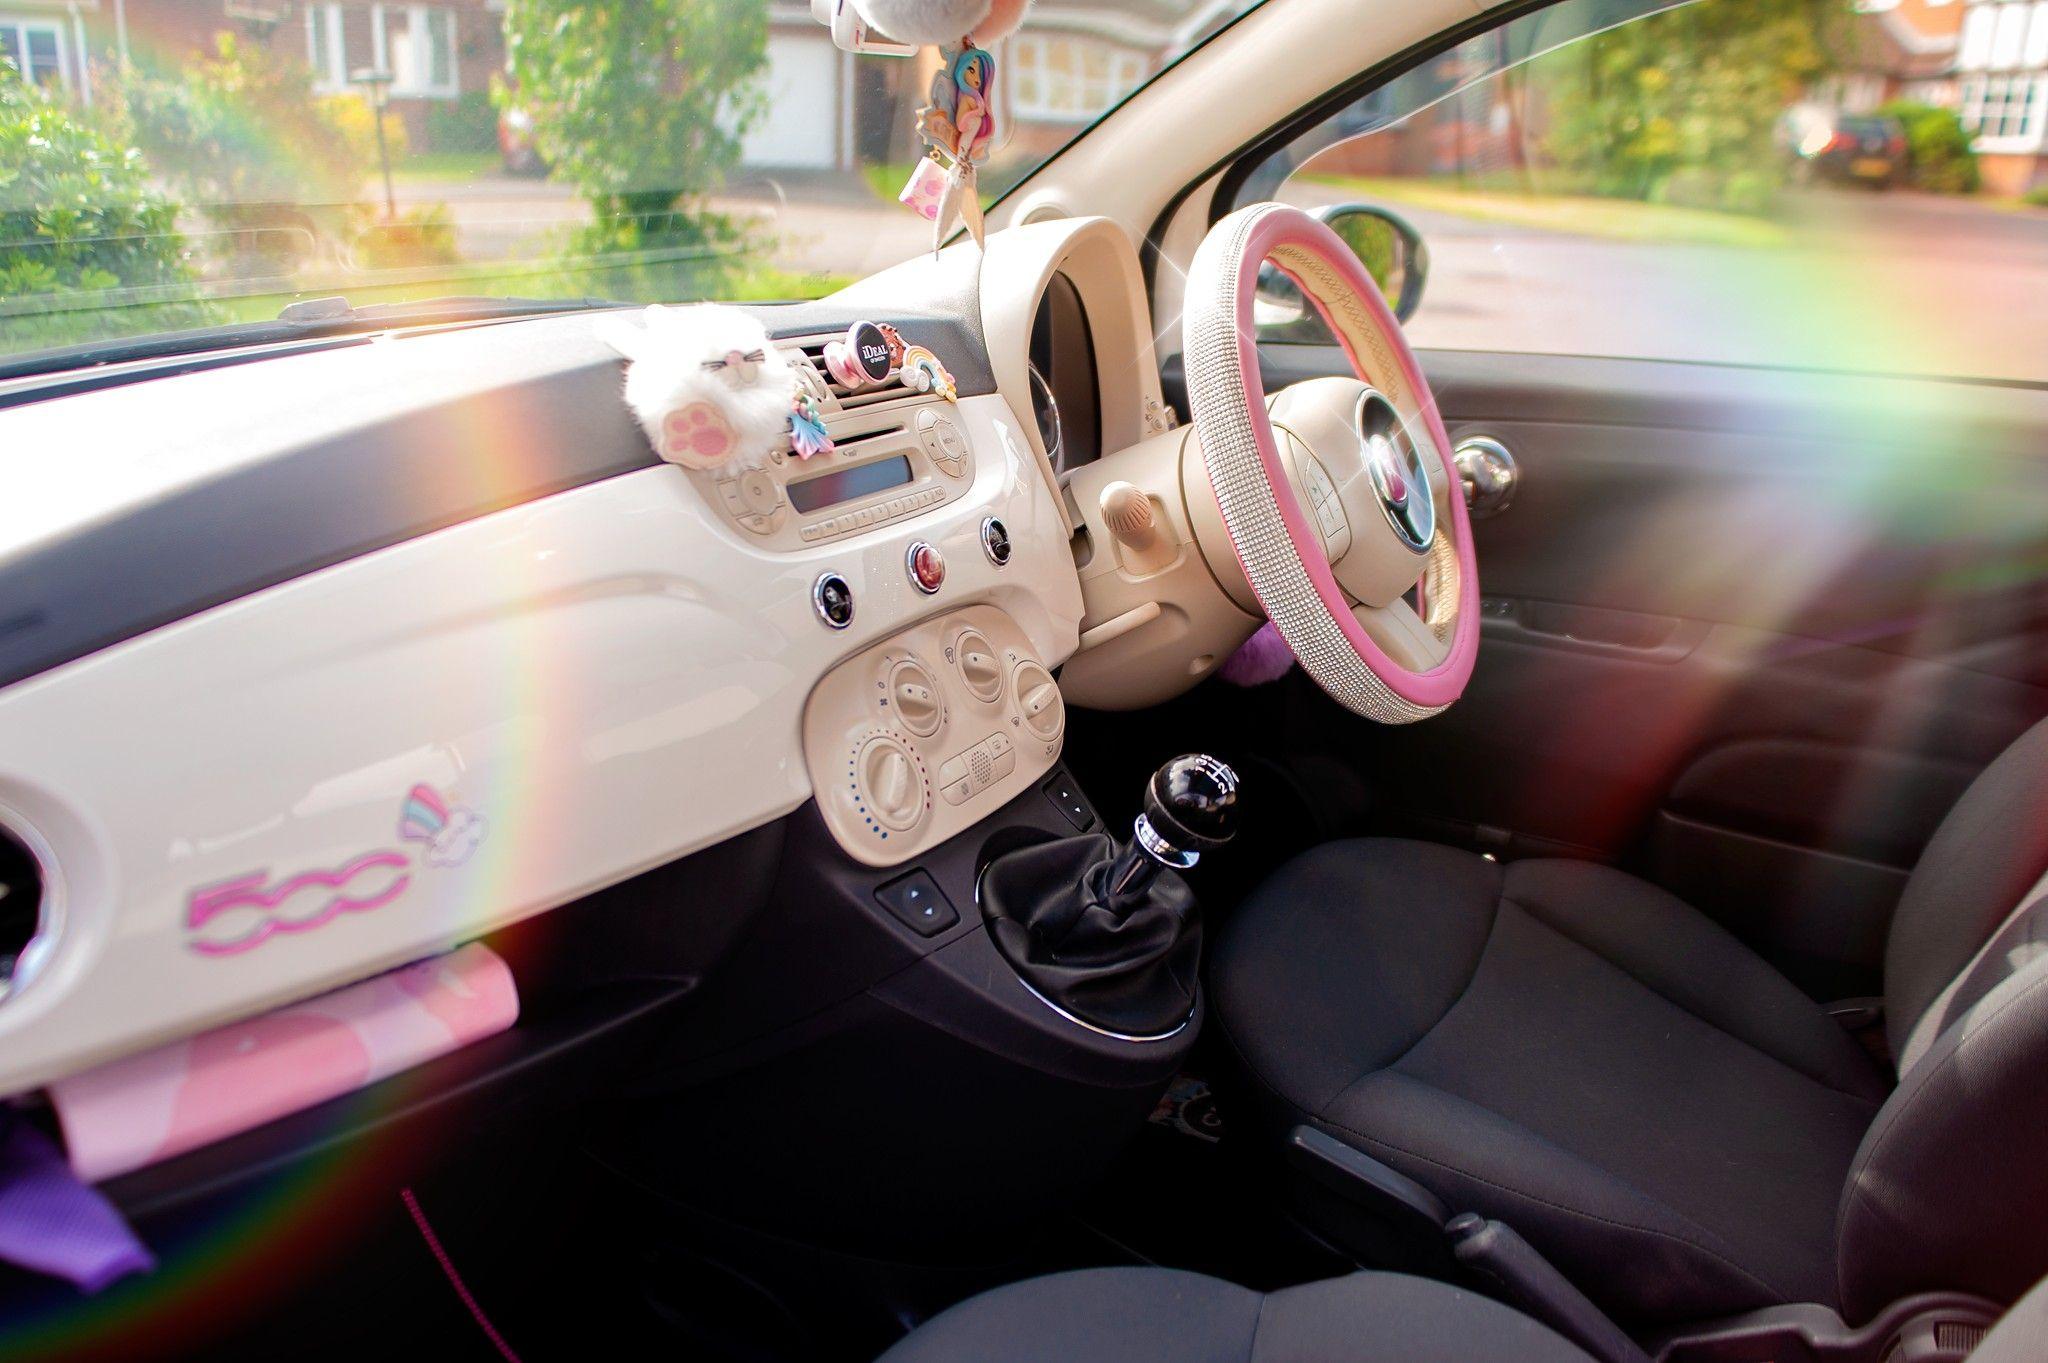 Fiat 500 Fiat 500 Fiat 500 Interior Fiat